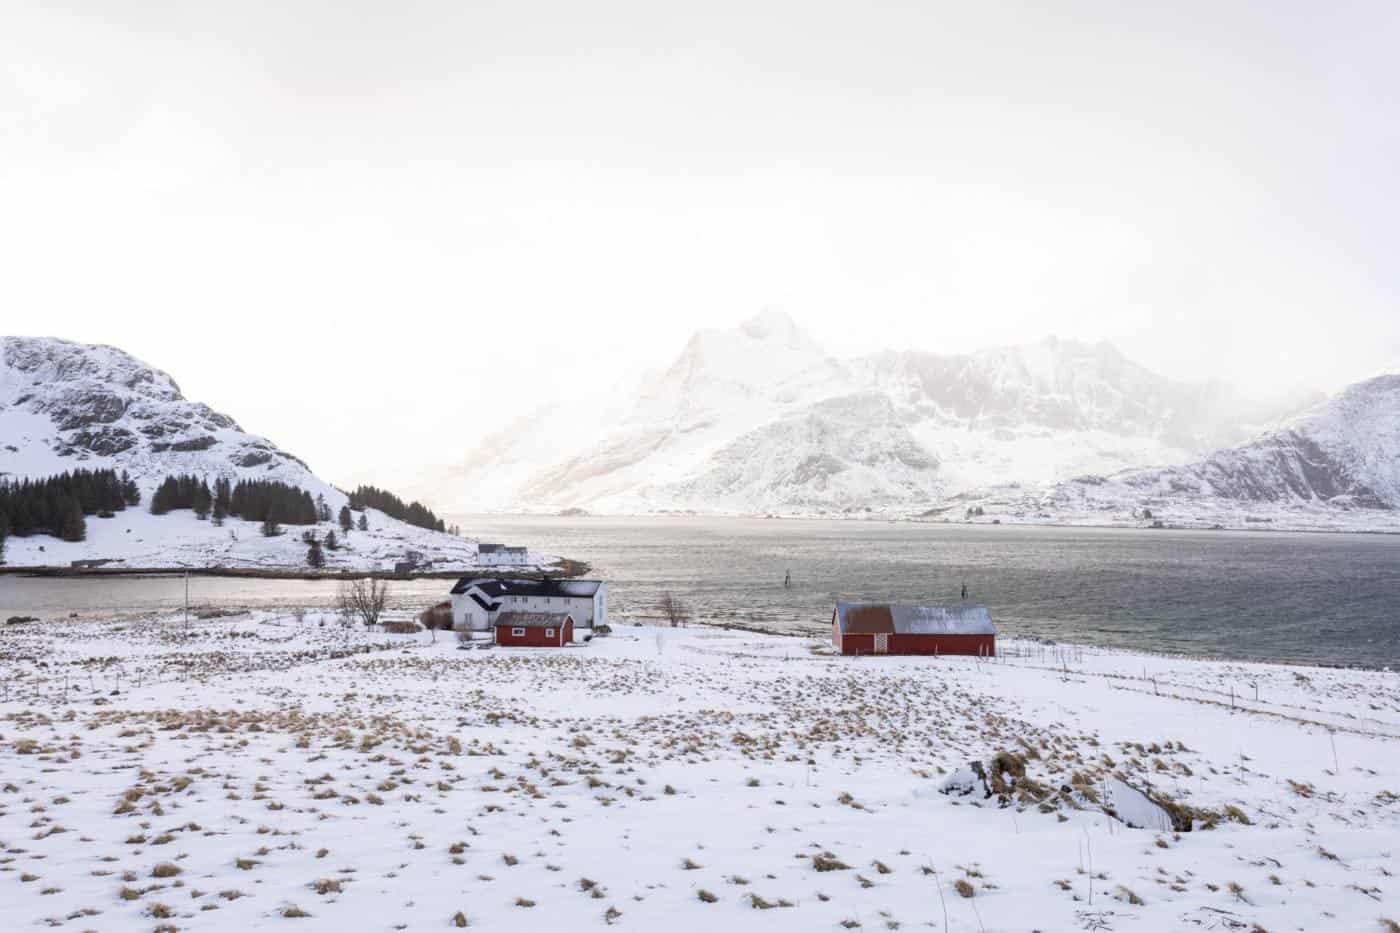 Best time to visit the lofoten islands